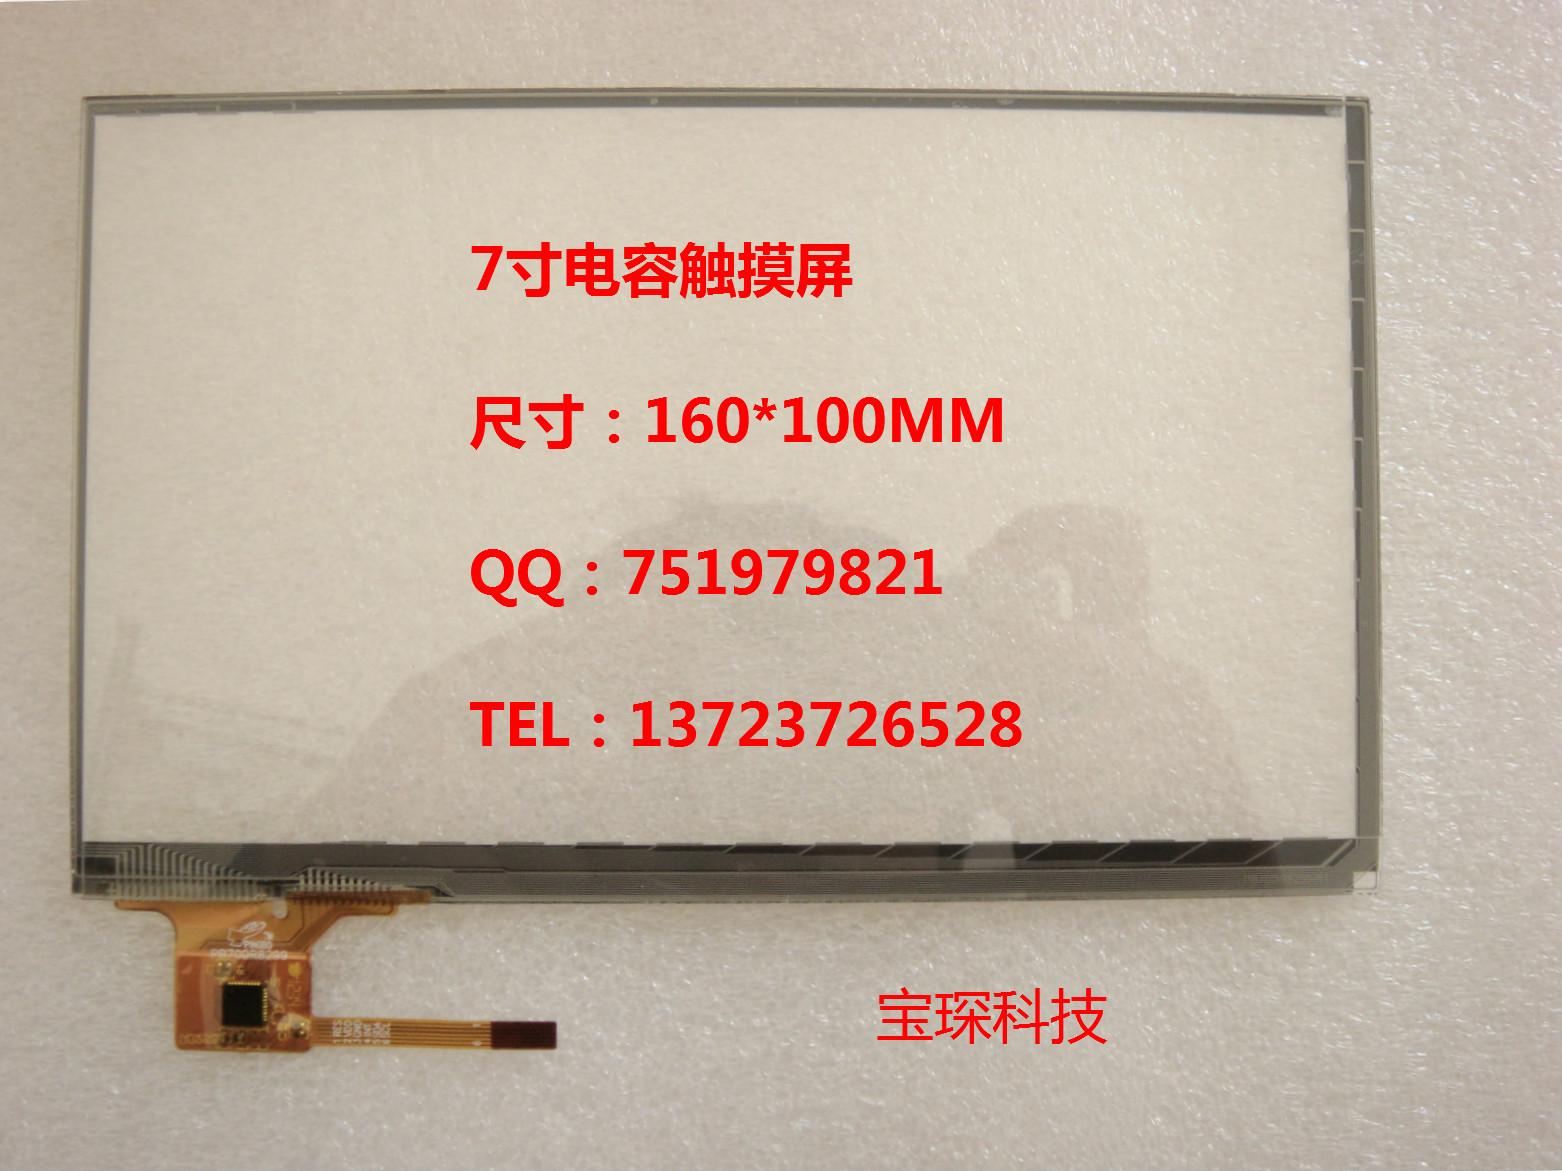 Панель для планшета 7 pb70dr8299 панель для планшета asus fonepad 7 fe170cg me170cg k012 for fe170cg me170cg k012